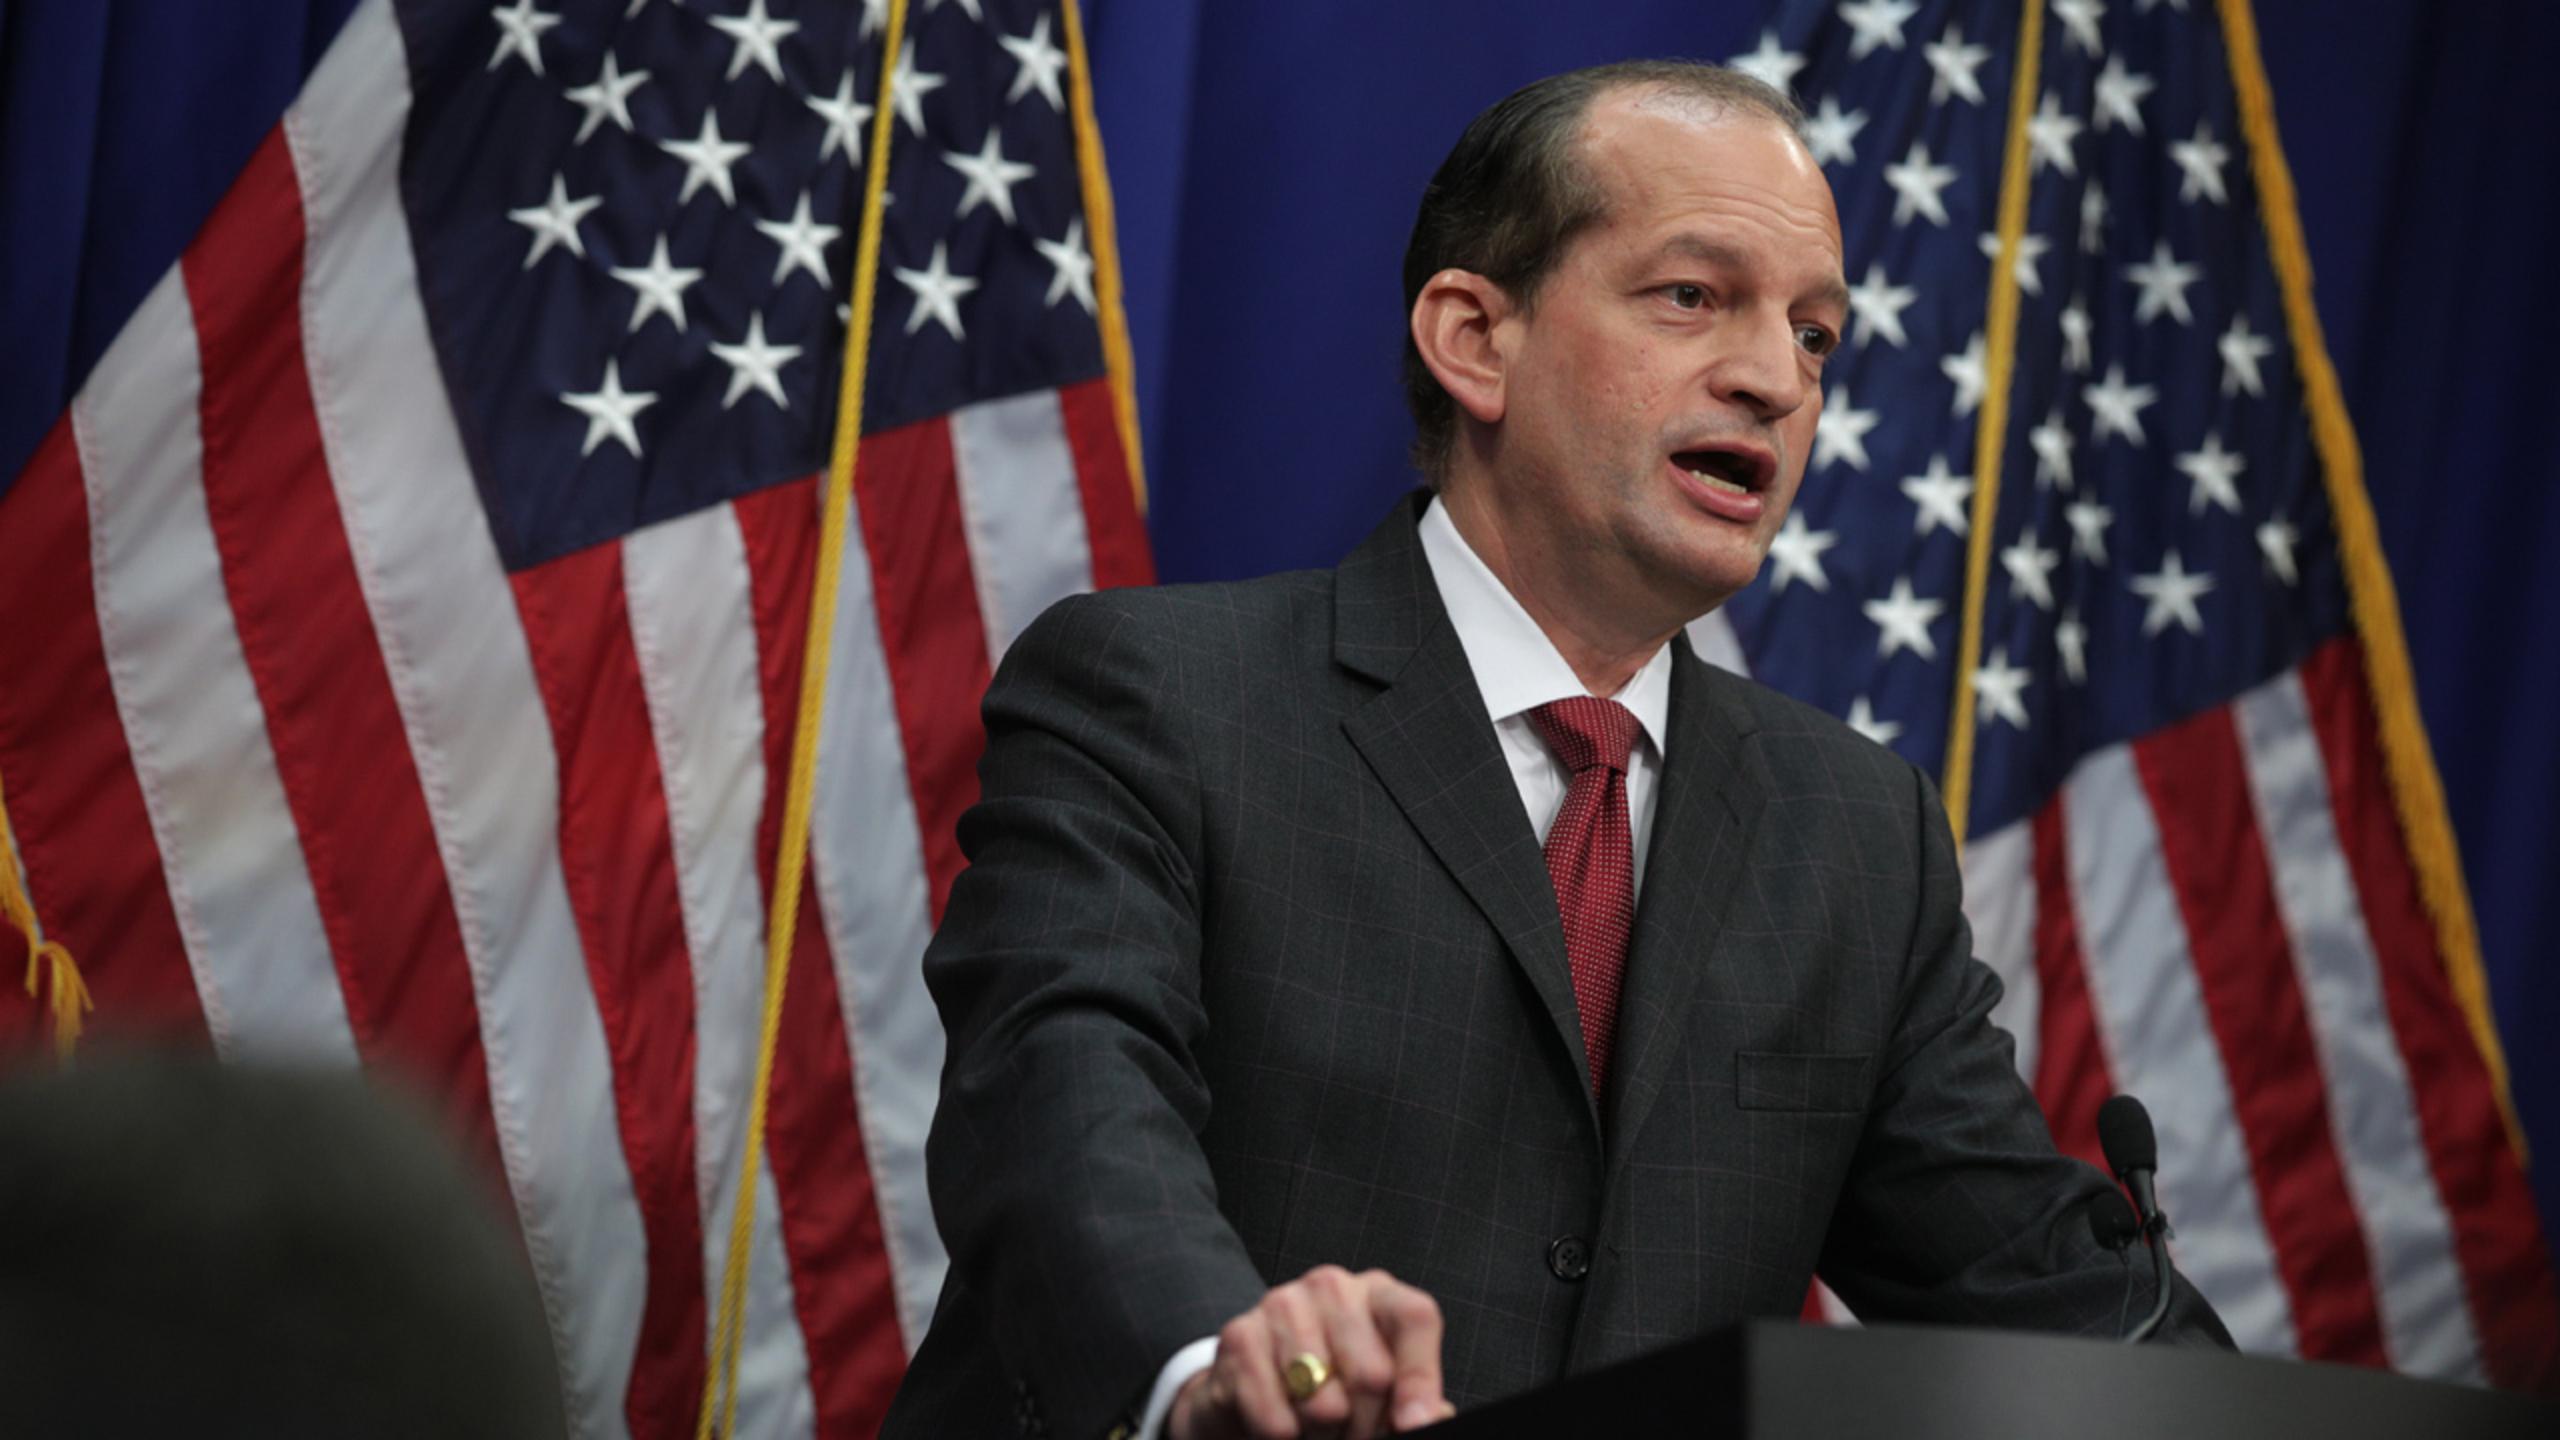 United States Secretary of Labor Alexander Acosta stepping down, Trump says